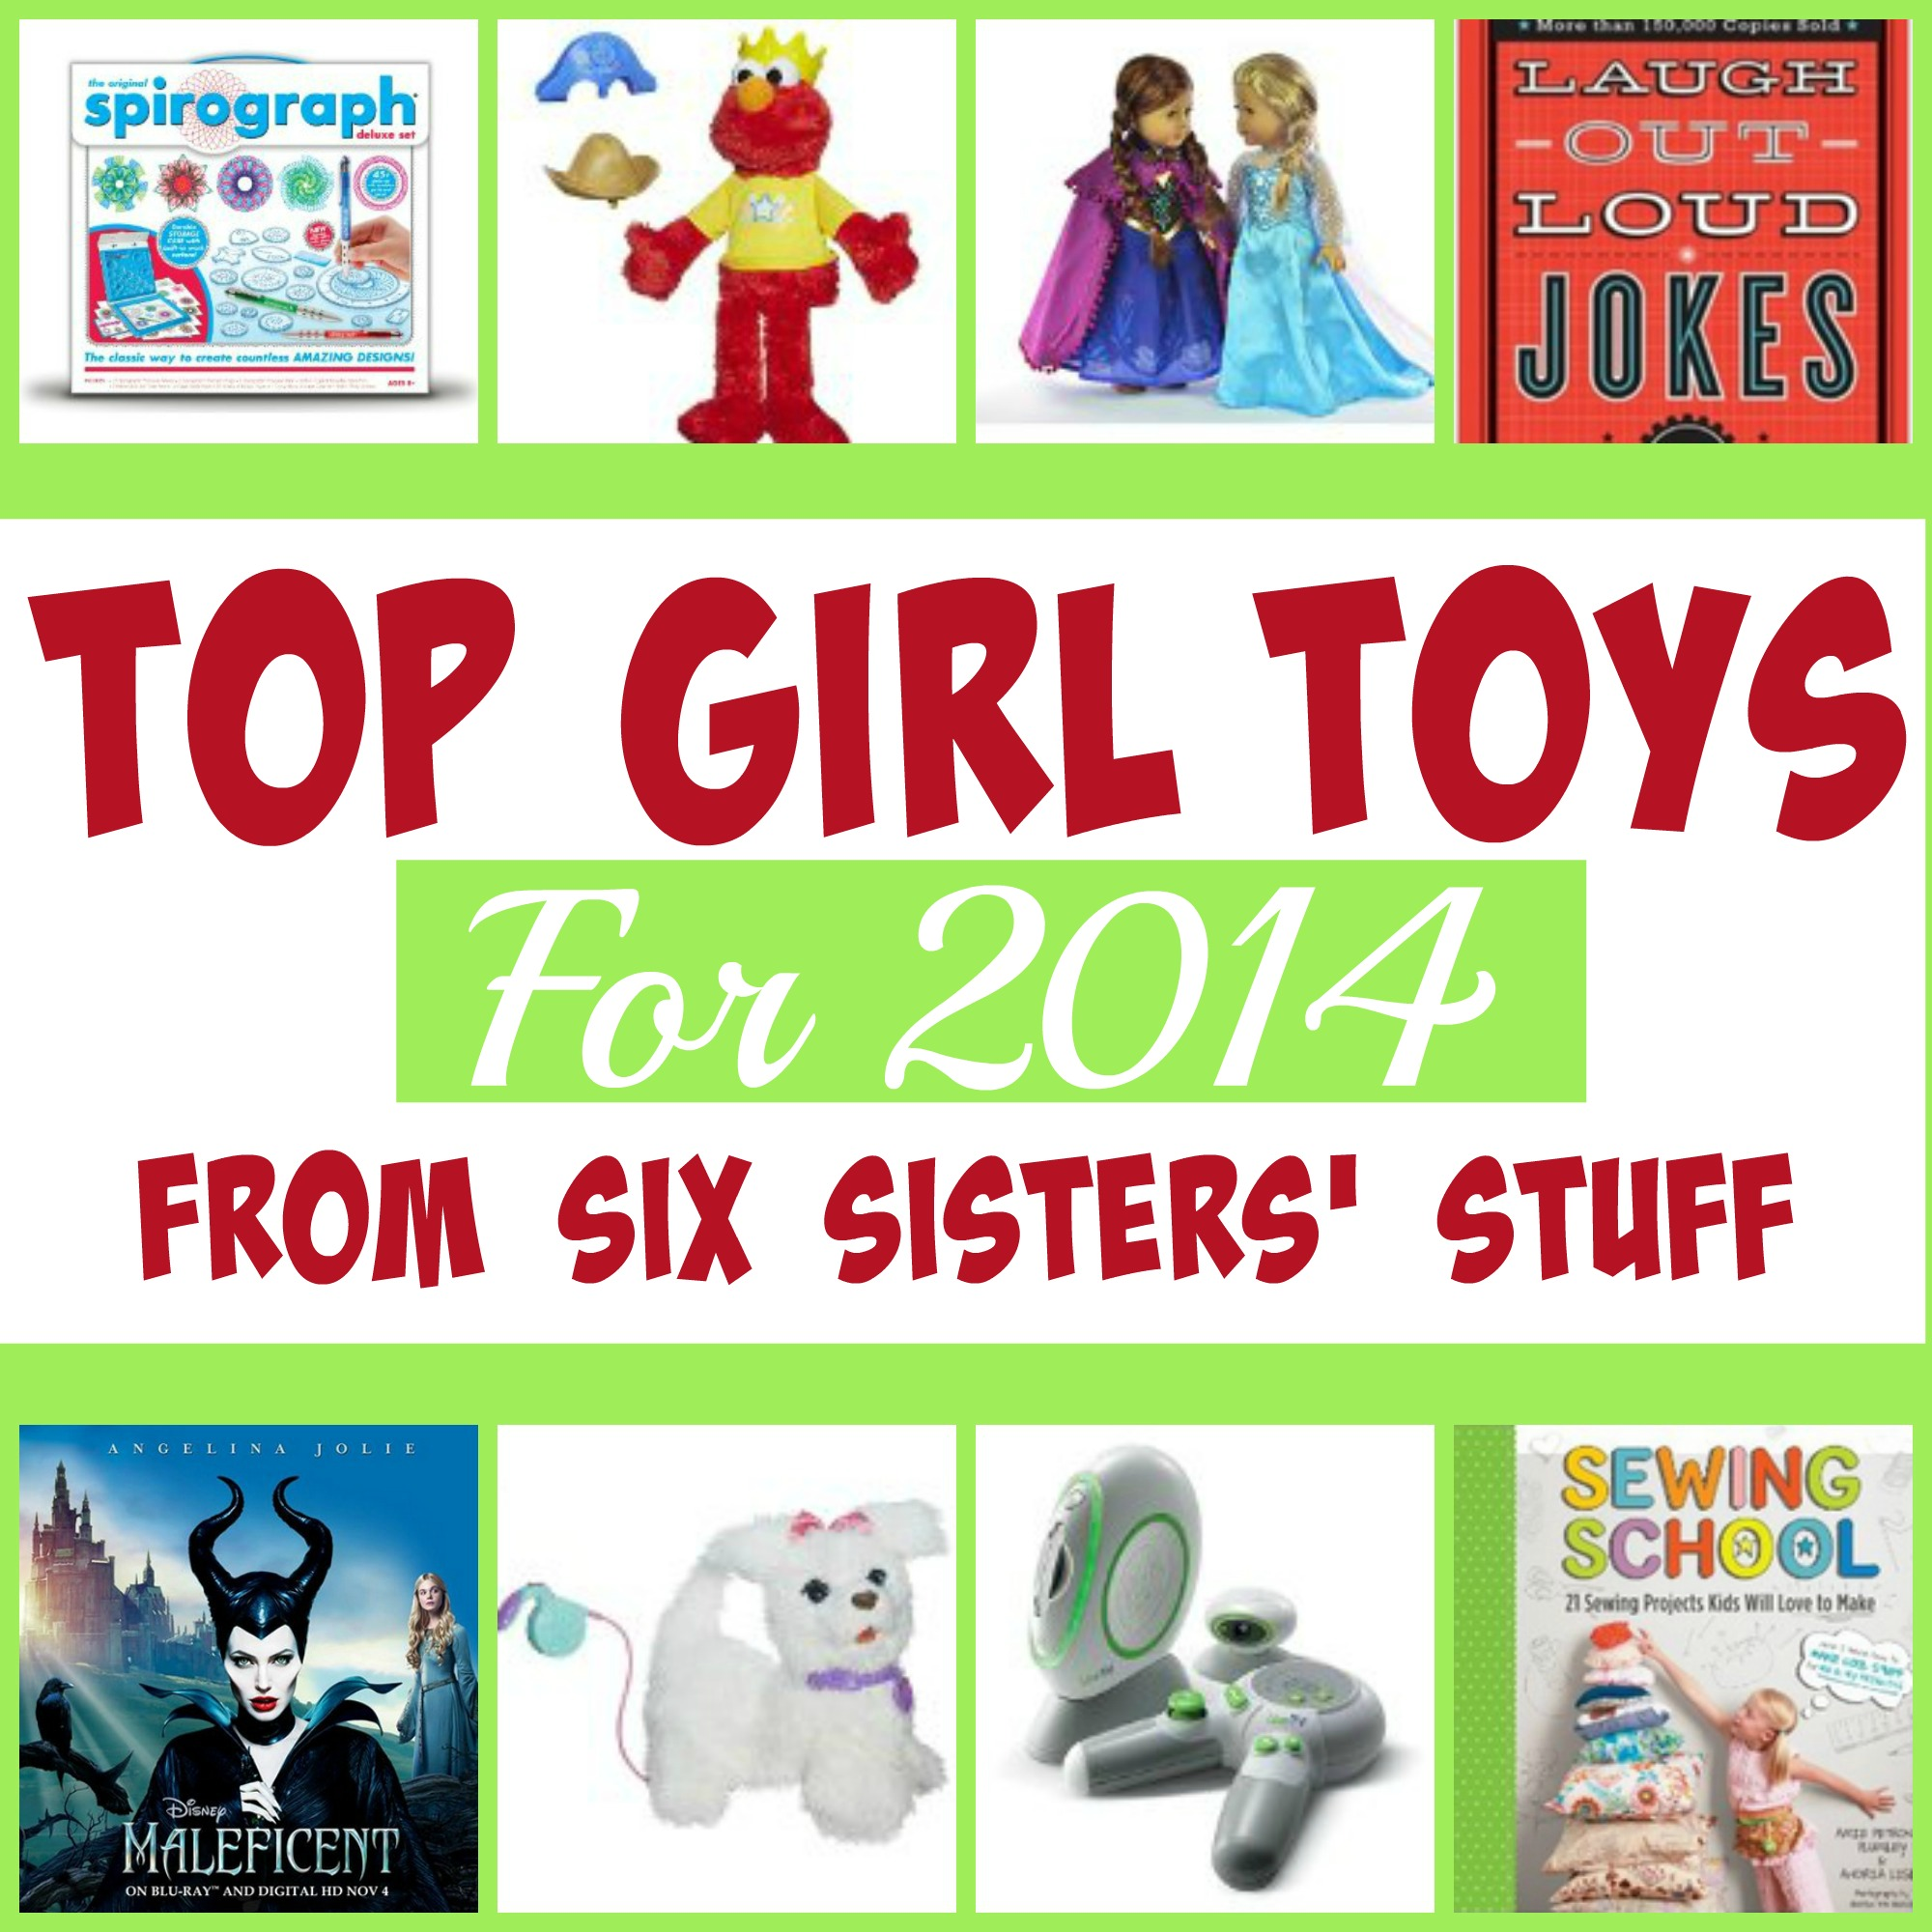 Toy girl toys